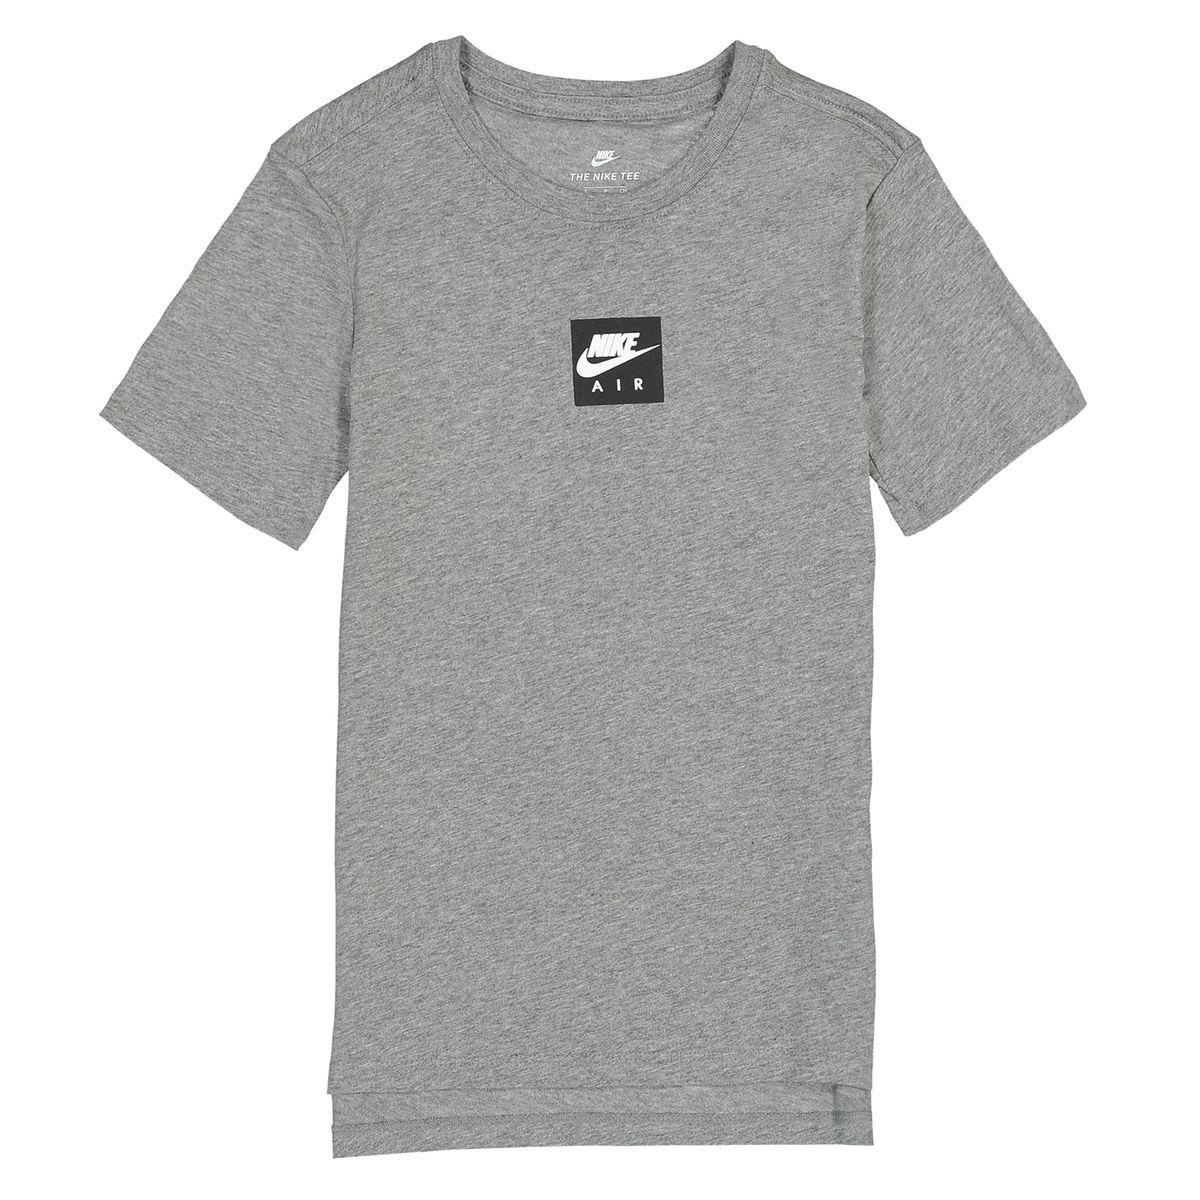 Tee-shirt 6 - 16 ans